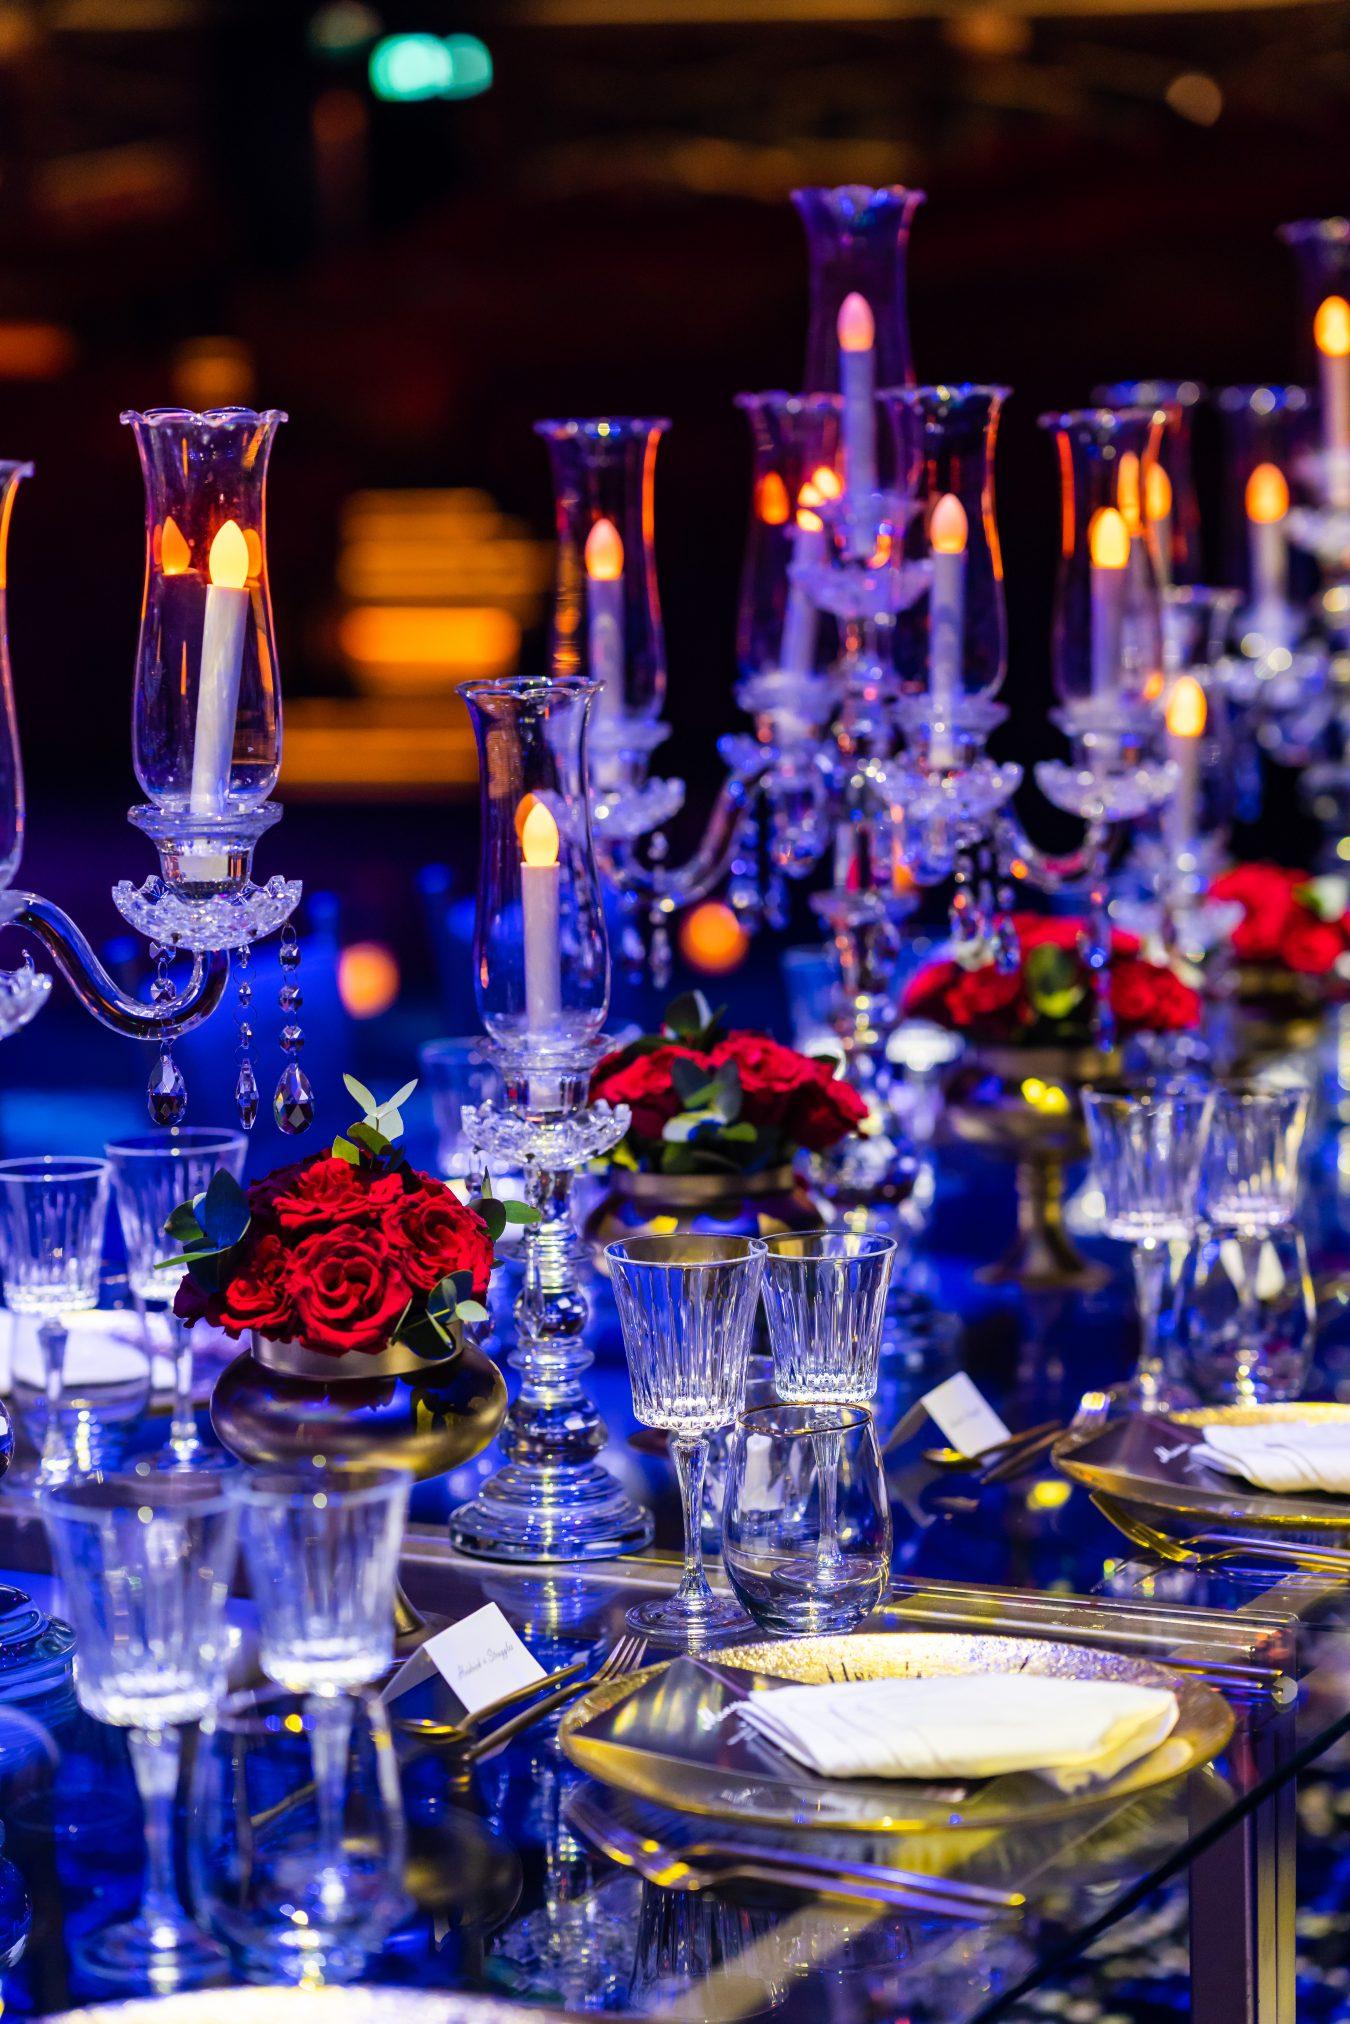 Dubai Opera red rose wedding table arrangement